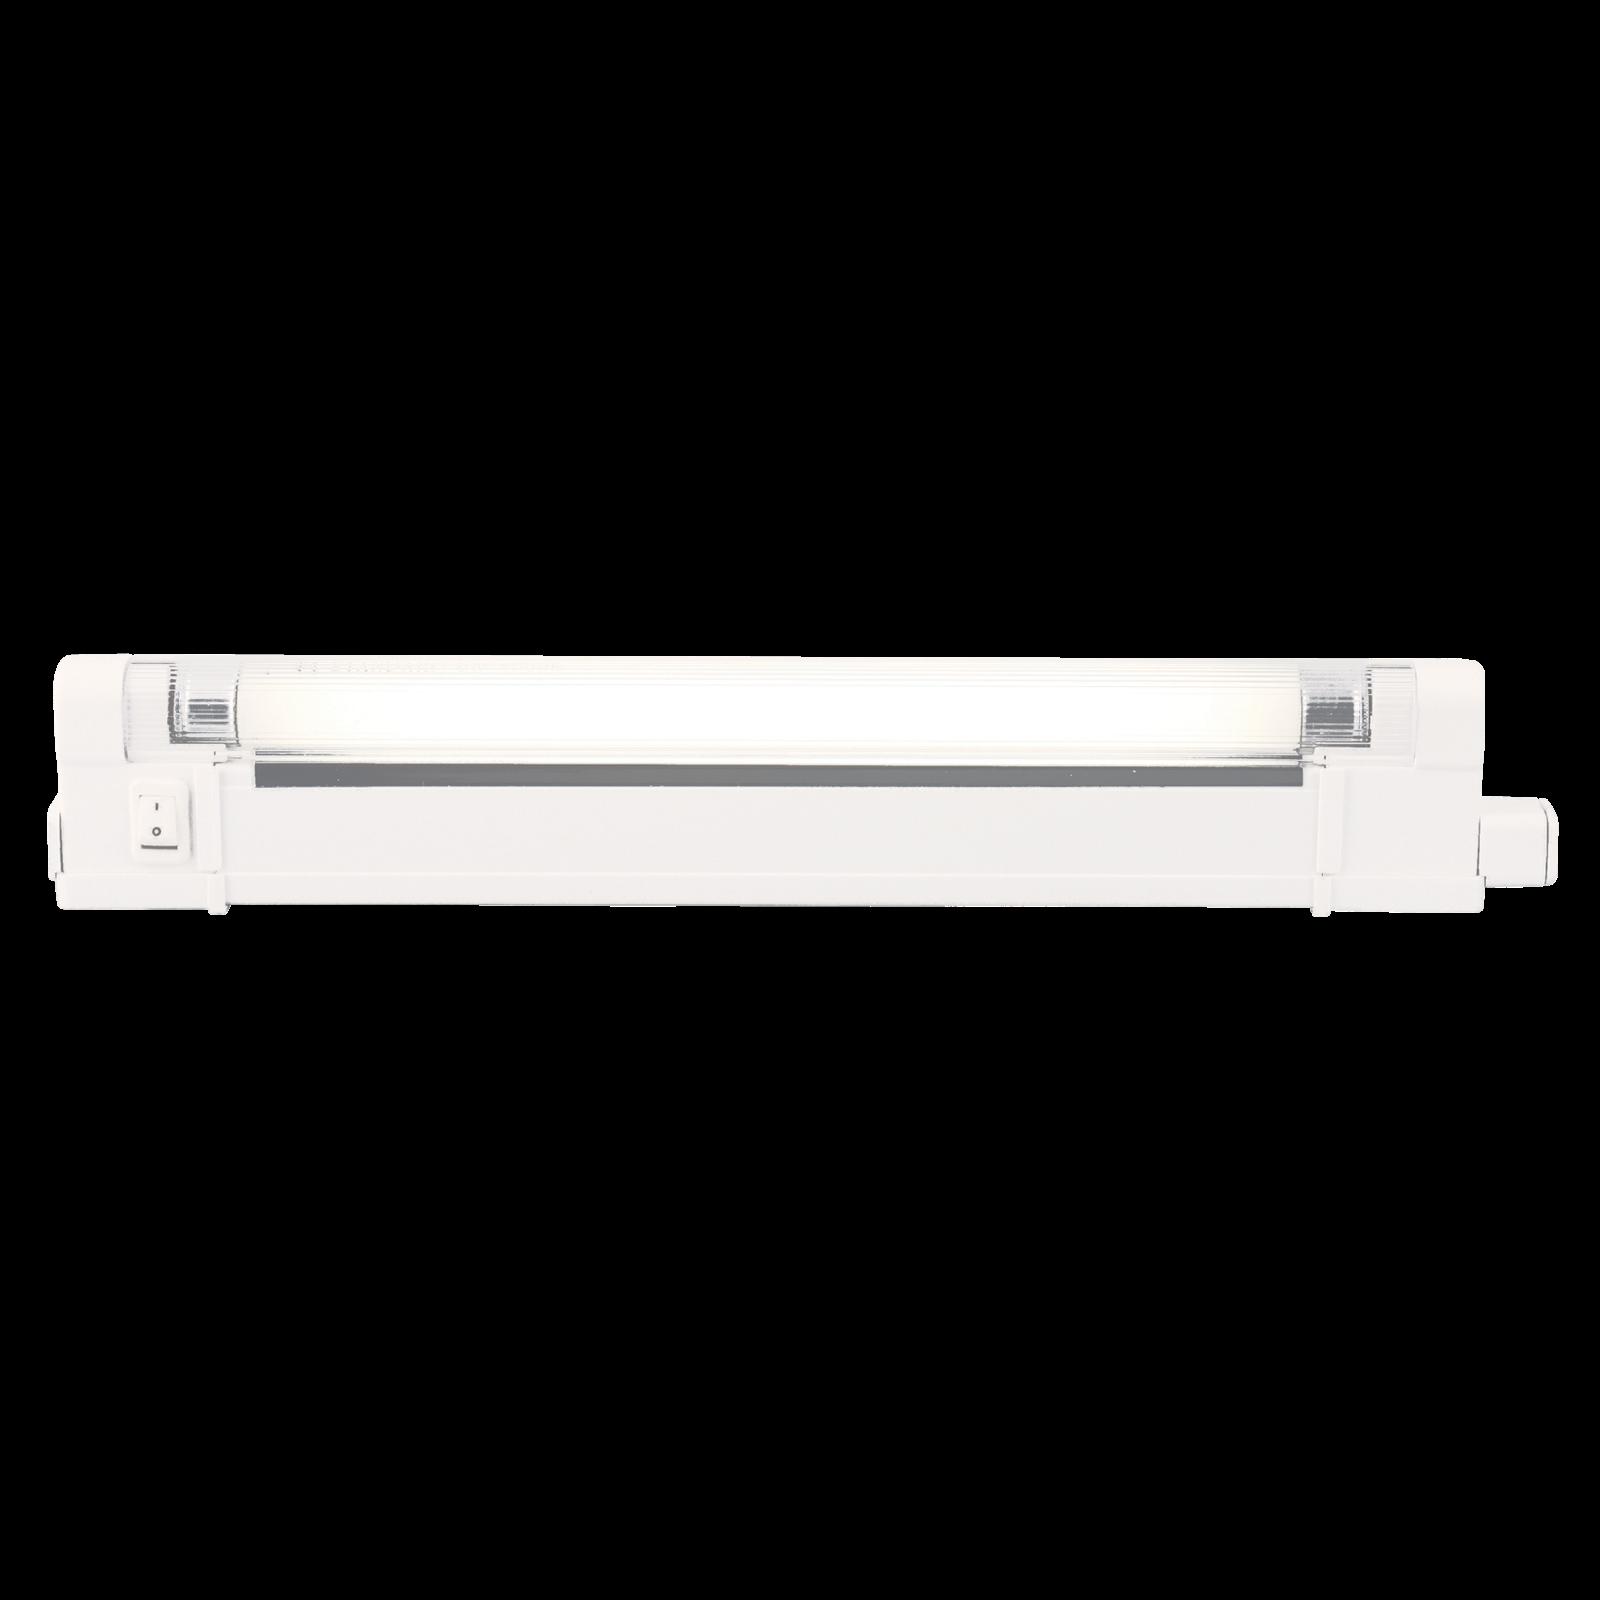 Knightsbridge Ucled13 Led Under Cabinet Striplight Cool White: T410